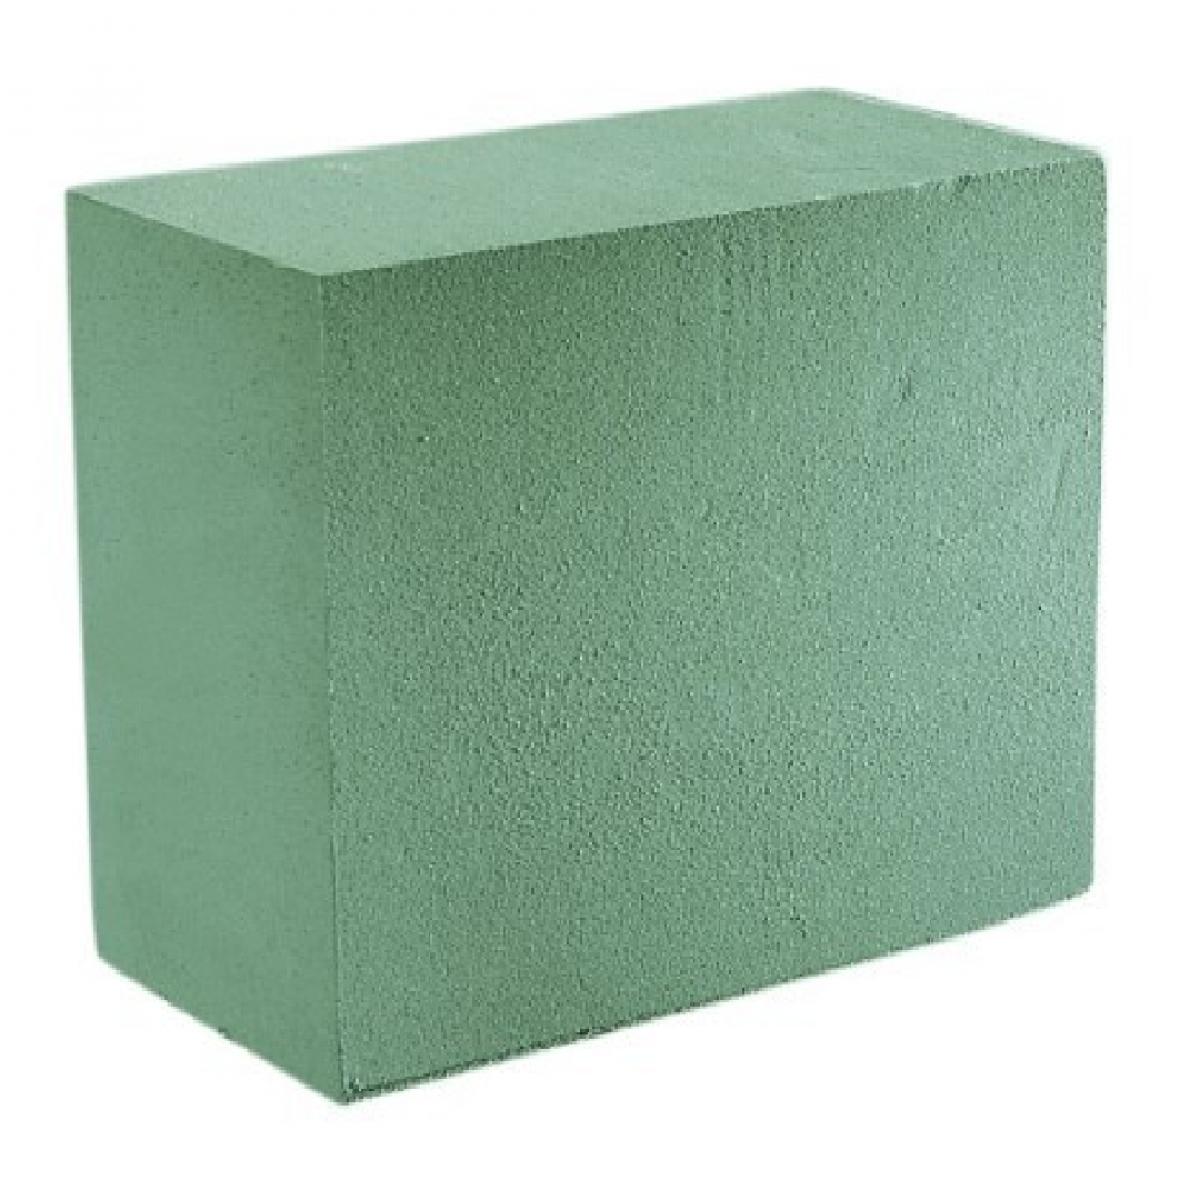 Oasis Ideal Floral Foam Block Full - 1x1